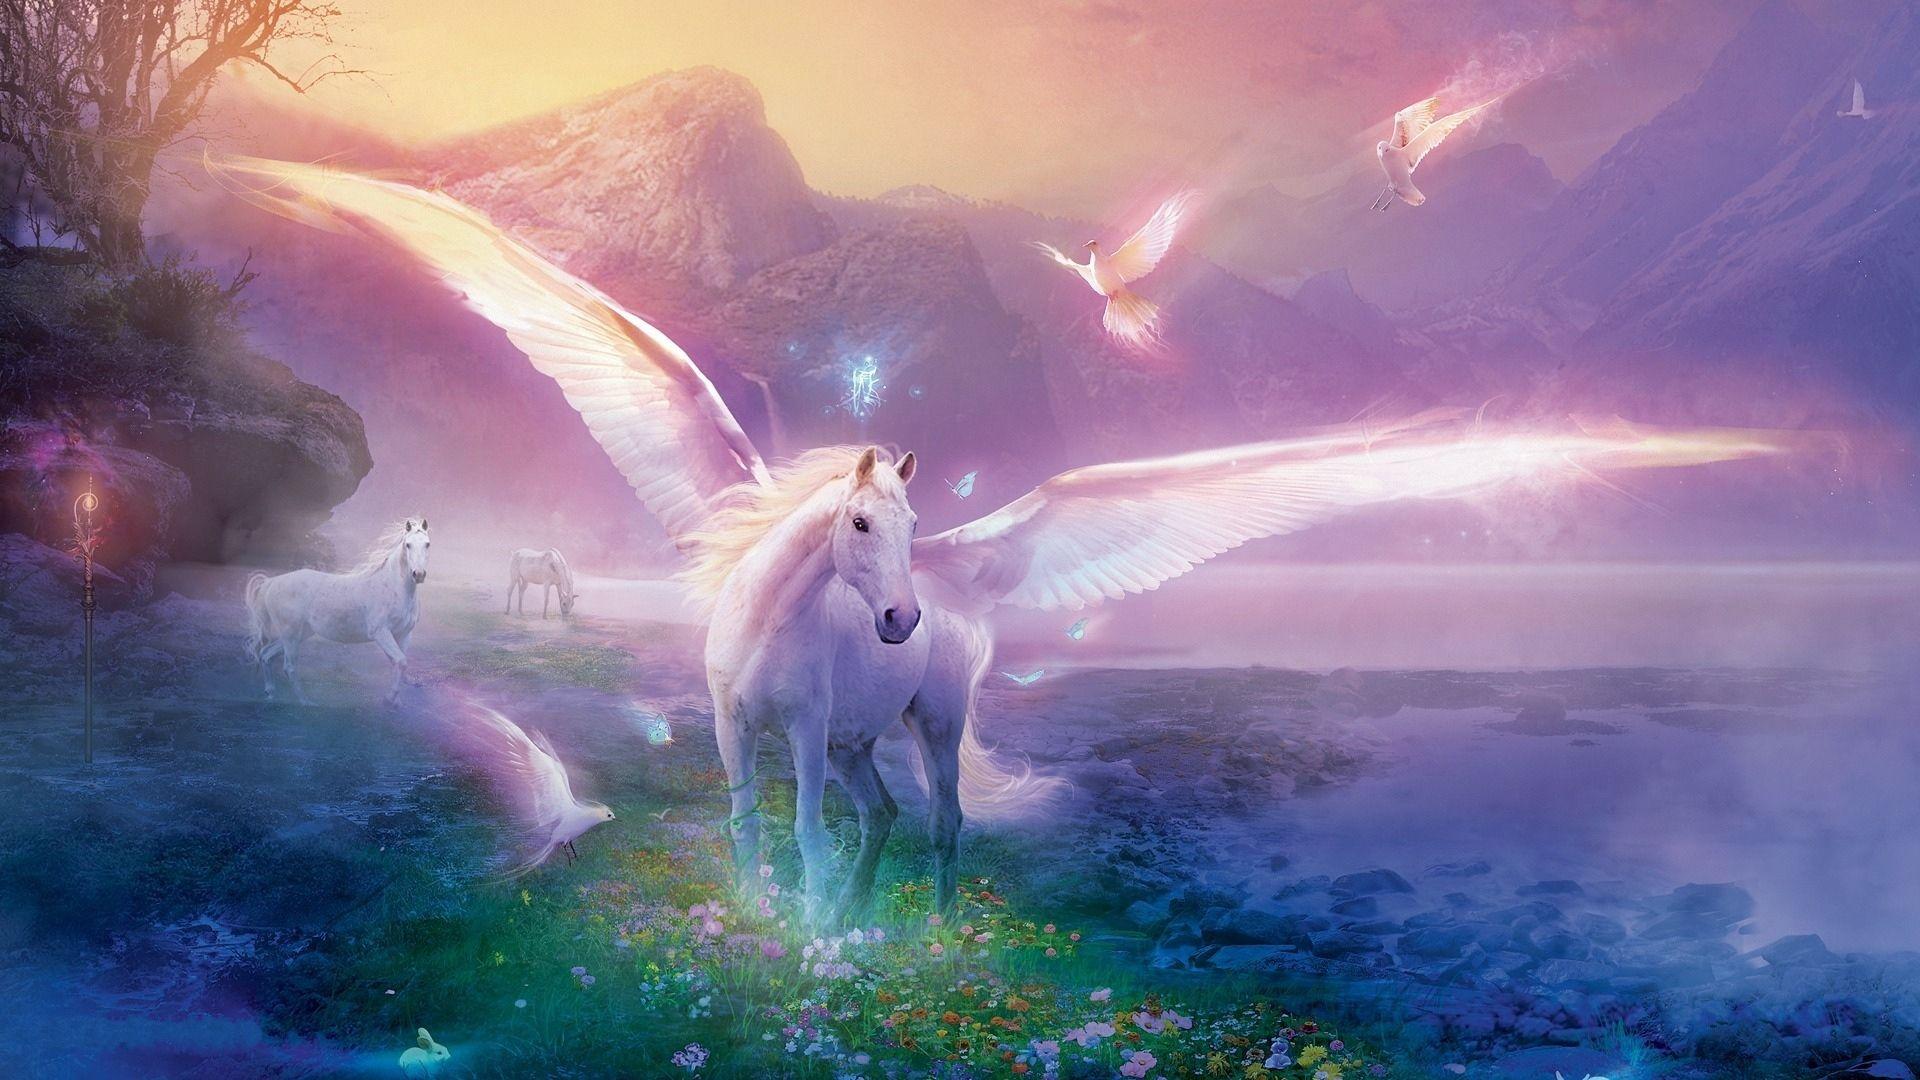 Unicorn good wallpaper hd